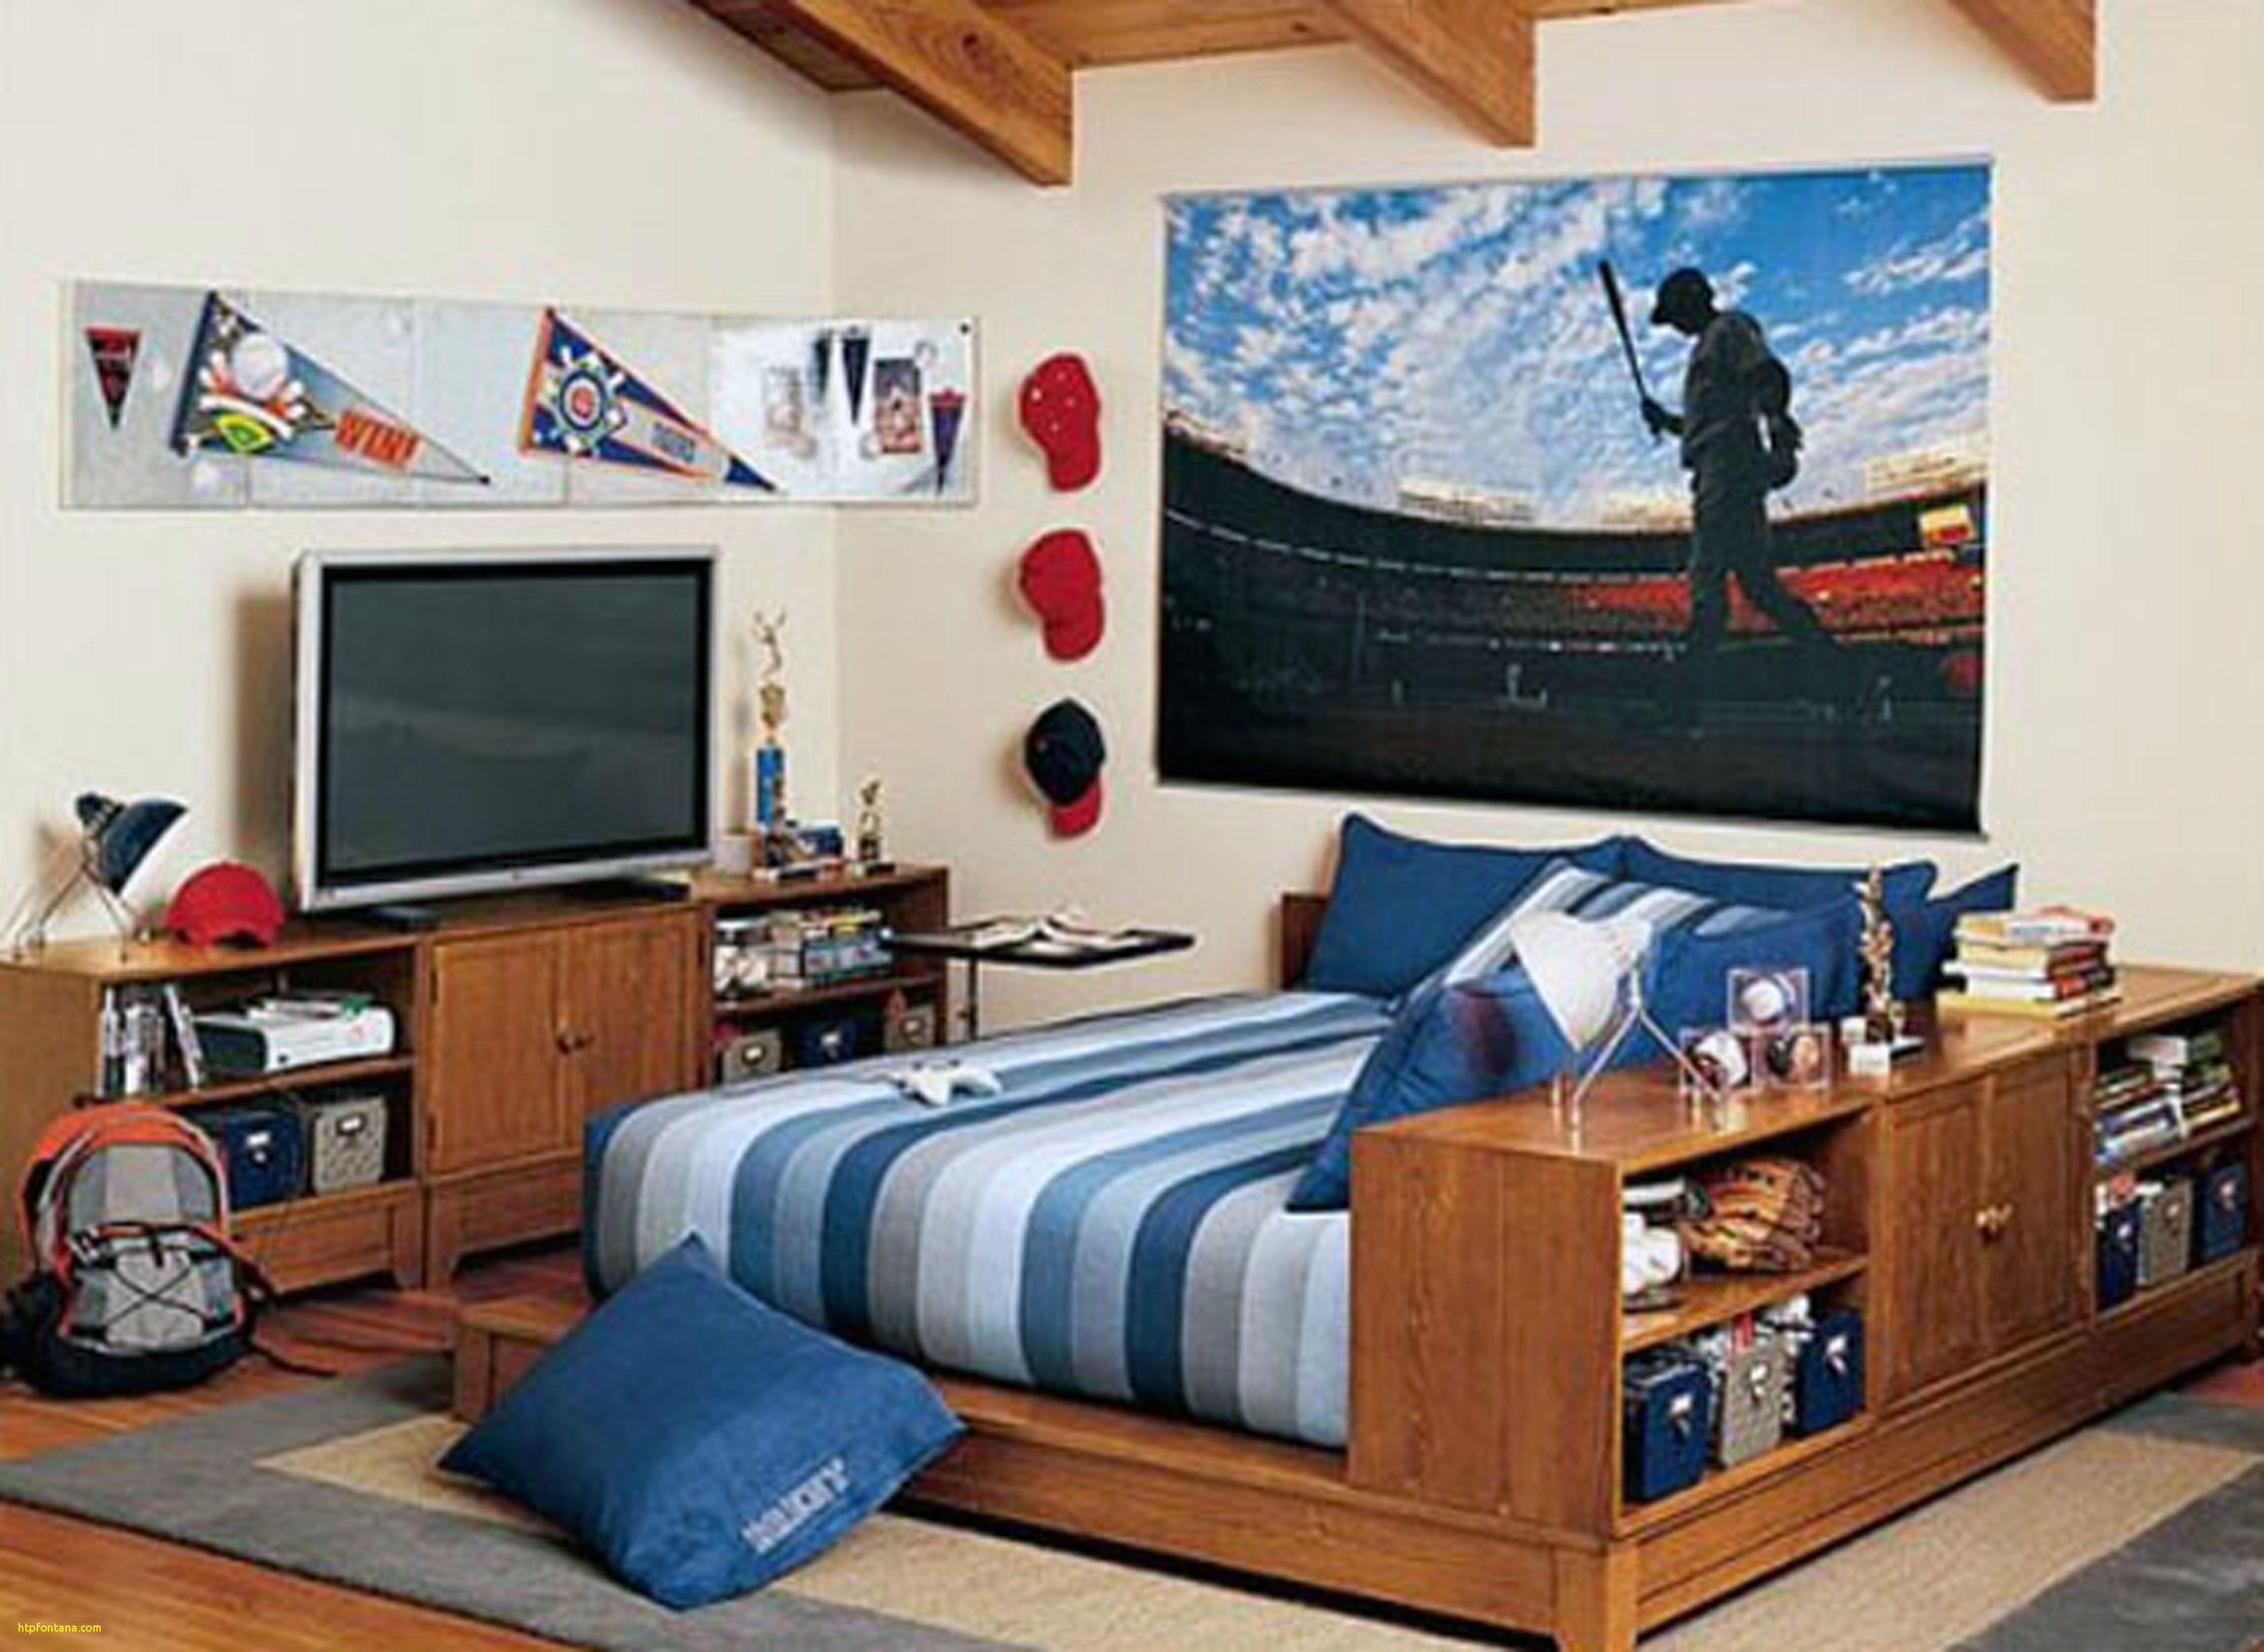 Boys bedroom furniture living room design small room luxury young teenagers bedroom furniture modern WMWEOJK